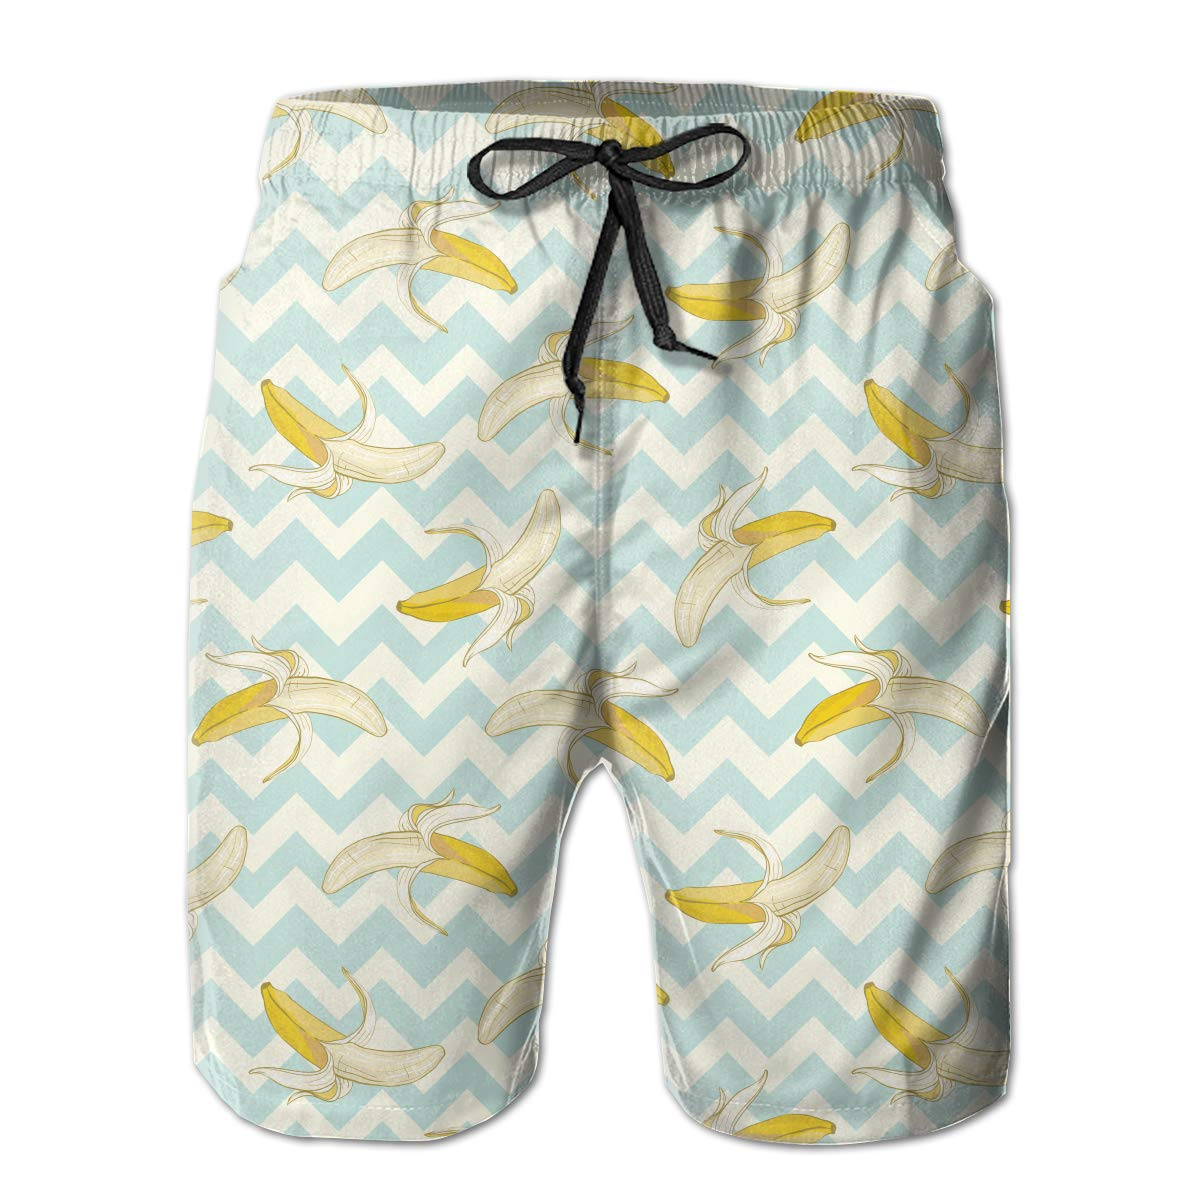 FRS Ltd Funny Bananas Mens Quick Dry Swim Trunks Beach Board Short Mesh Lining Vacation Surfing Shorts